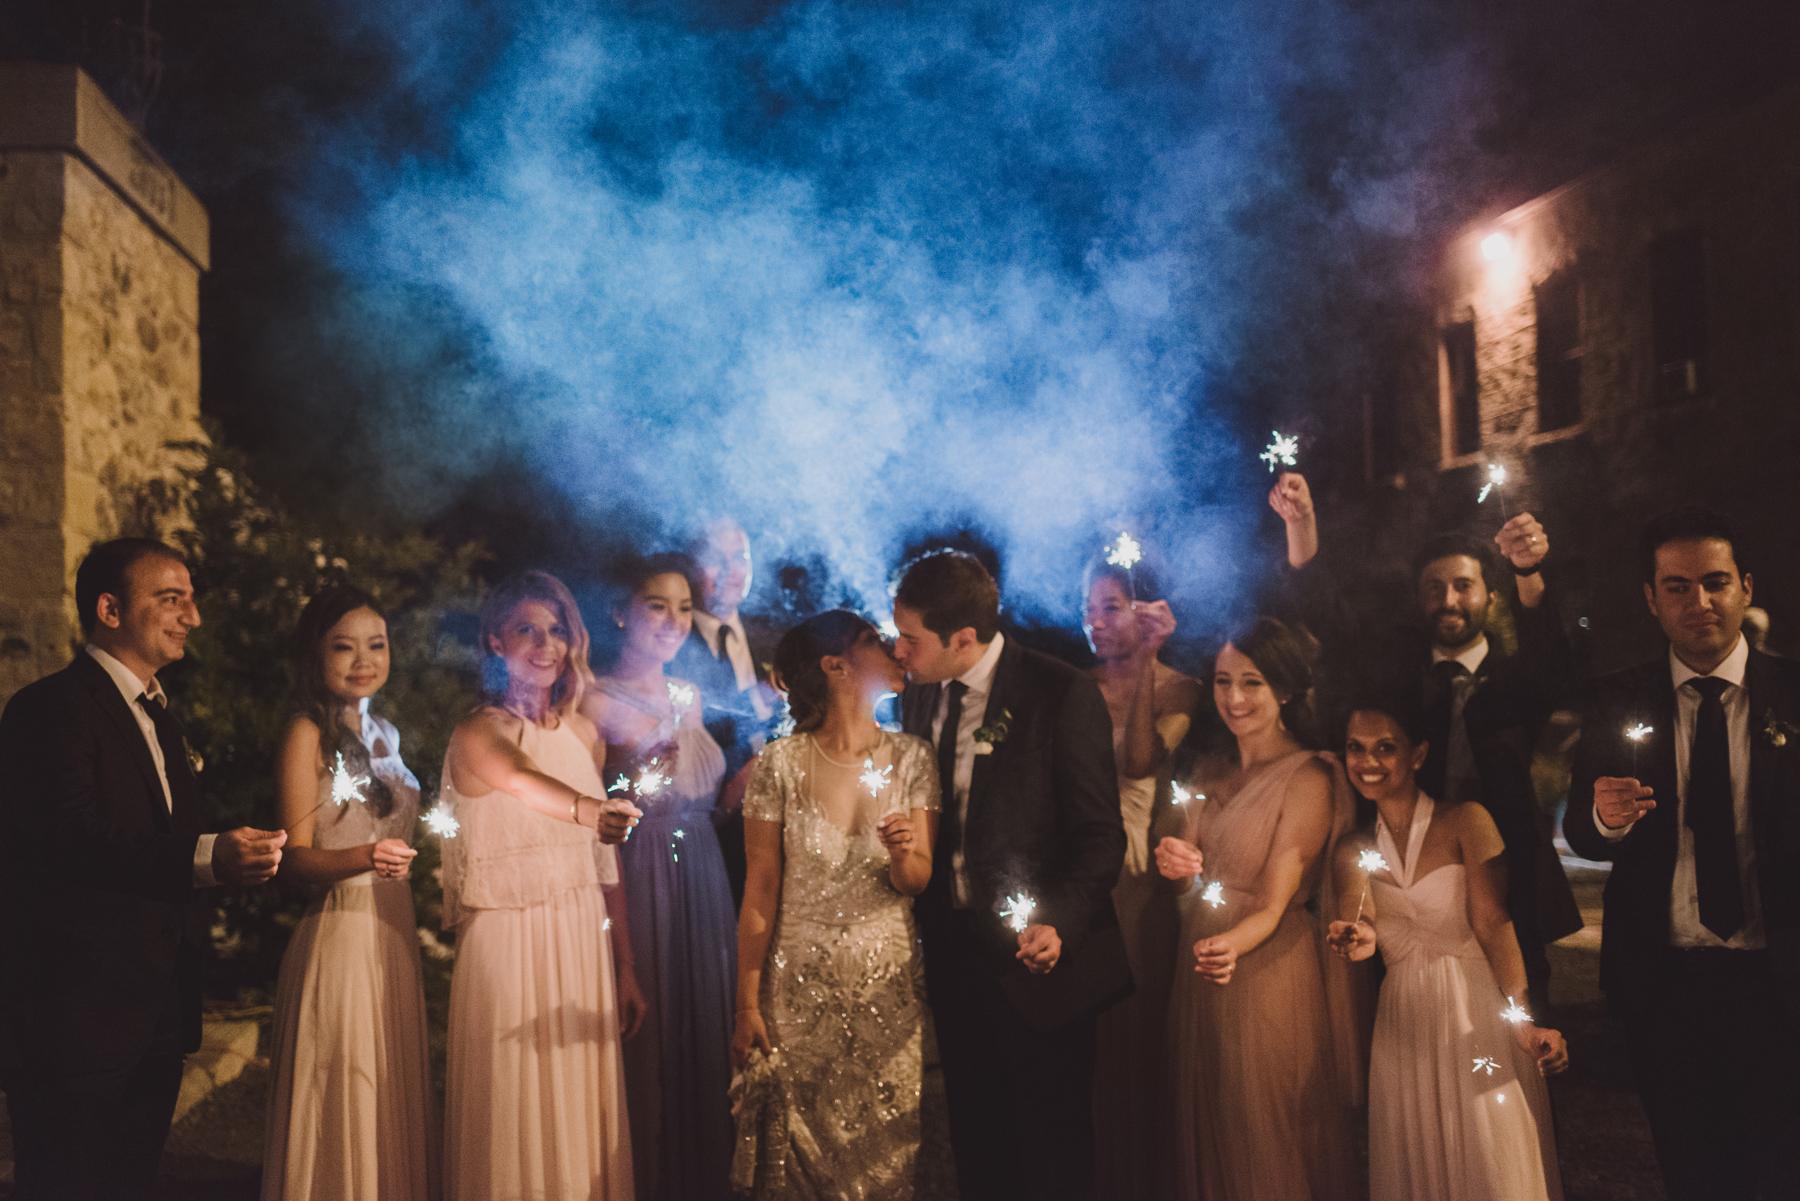 LVImagery-WeddingBells-DianaSohrab-50.JPG